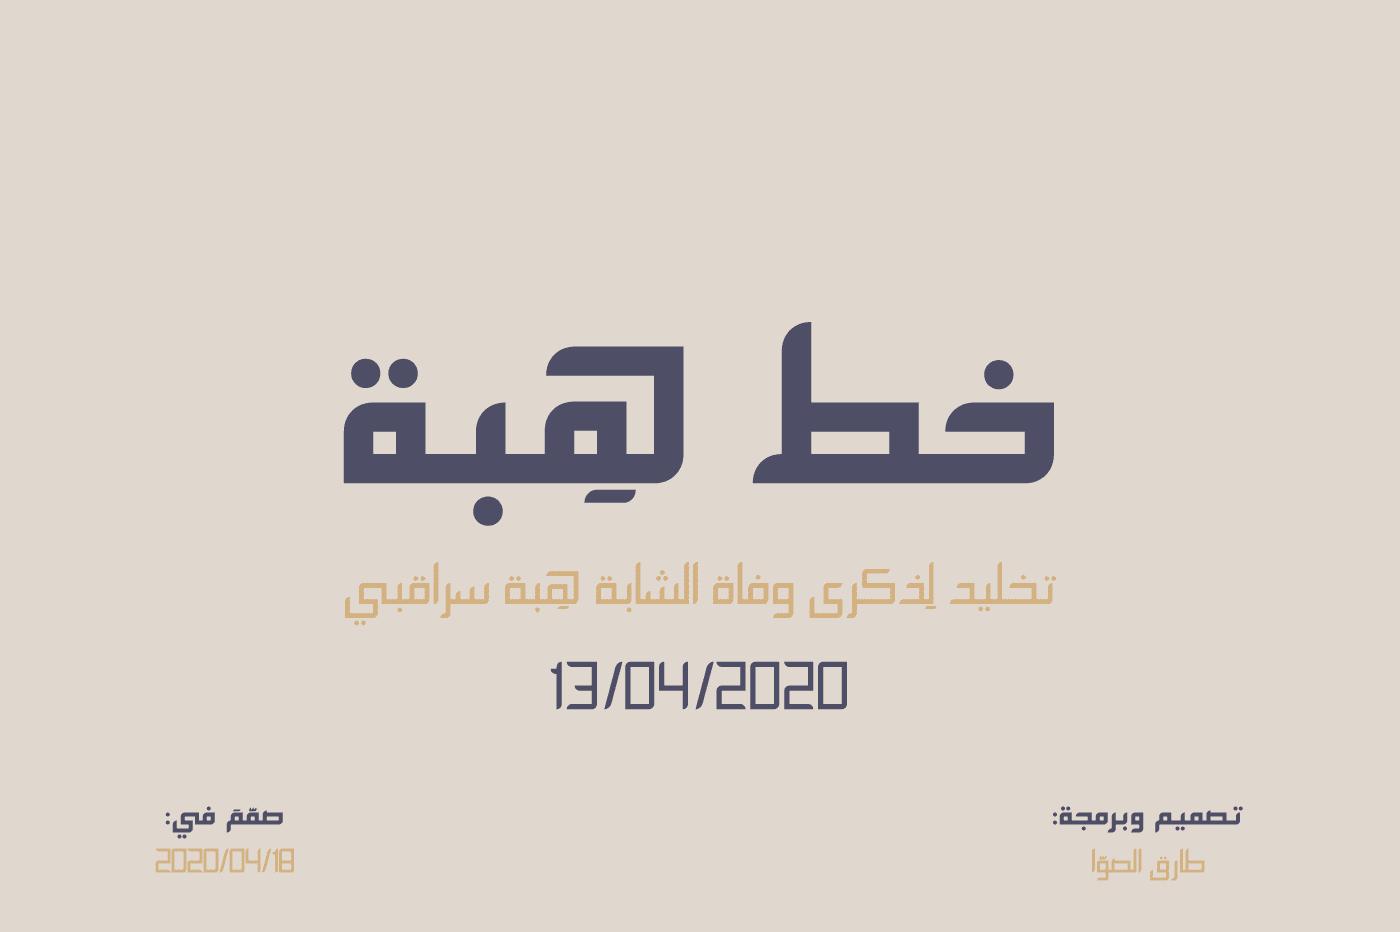 تحميل خط هبه الجديد - Download Hiba Font